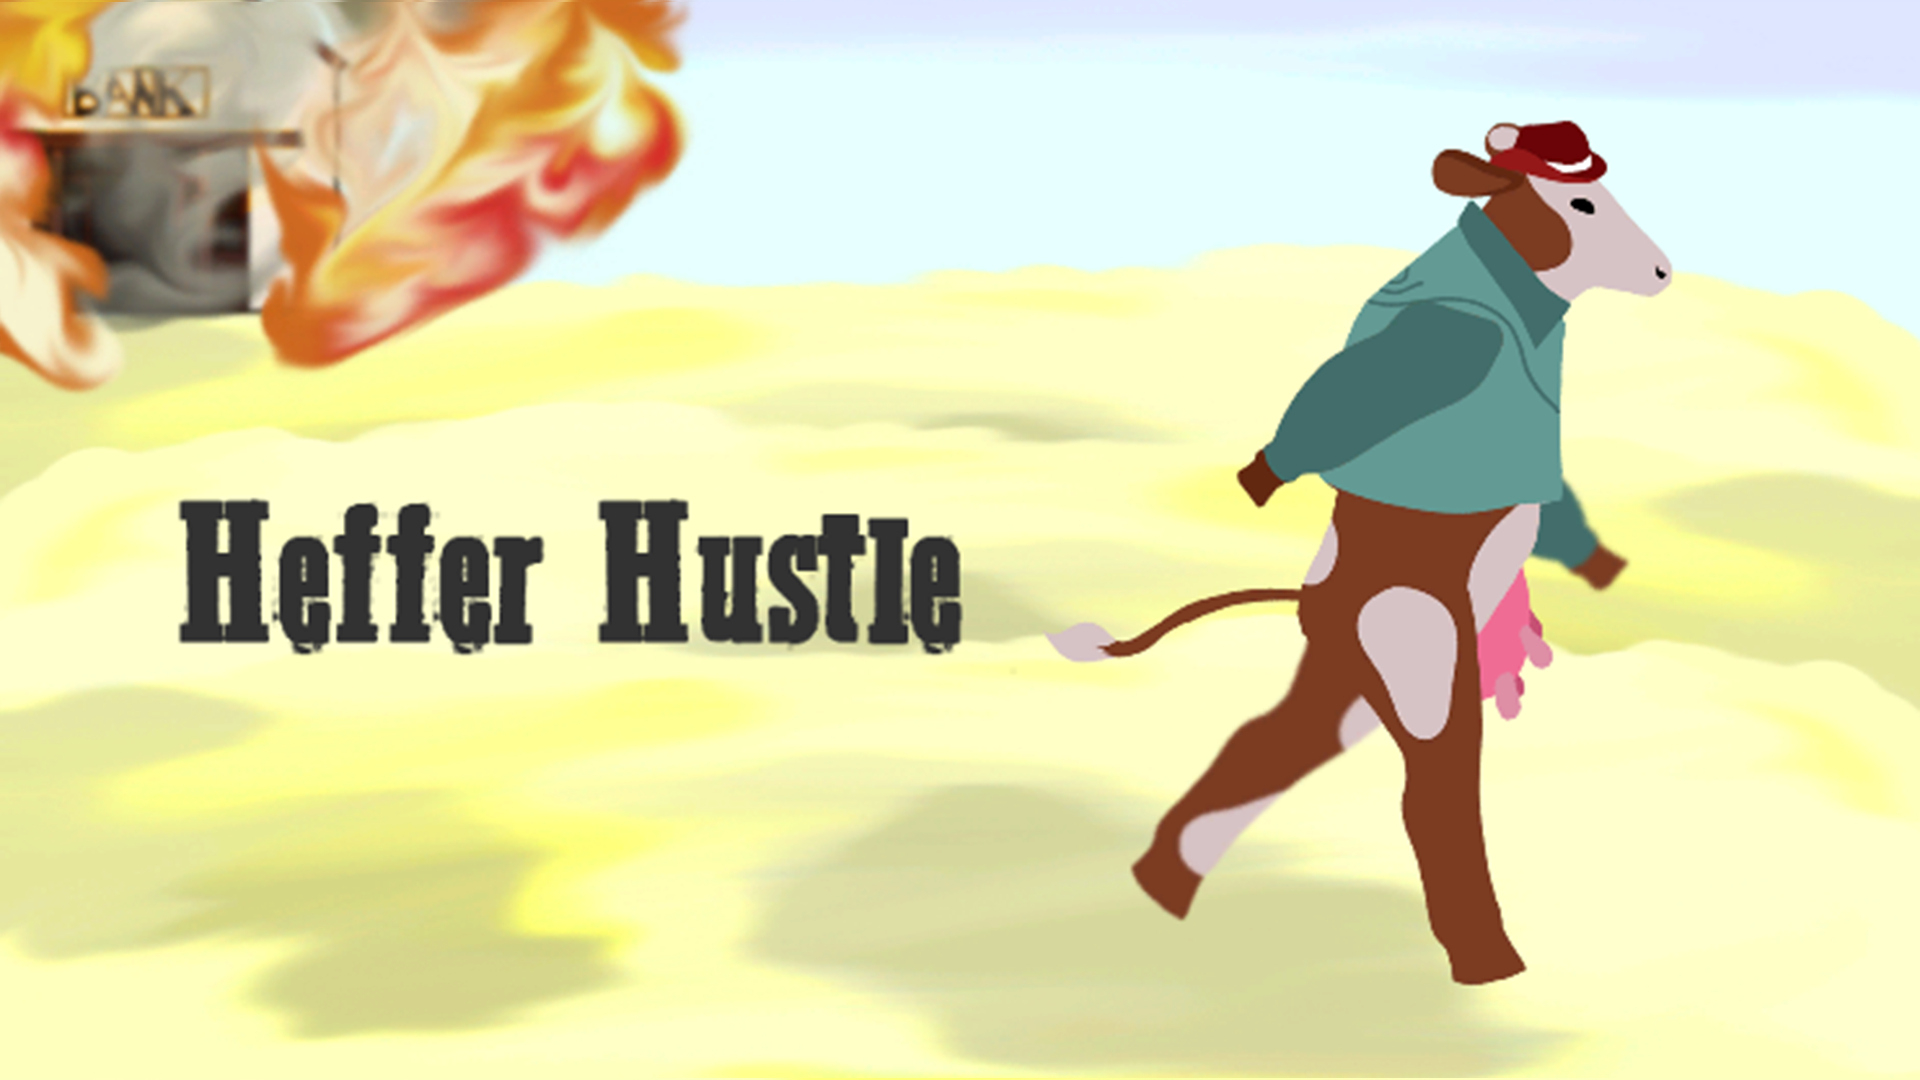 Heffer Hustle